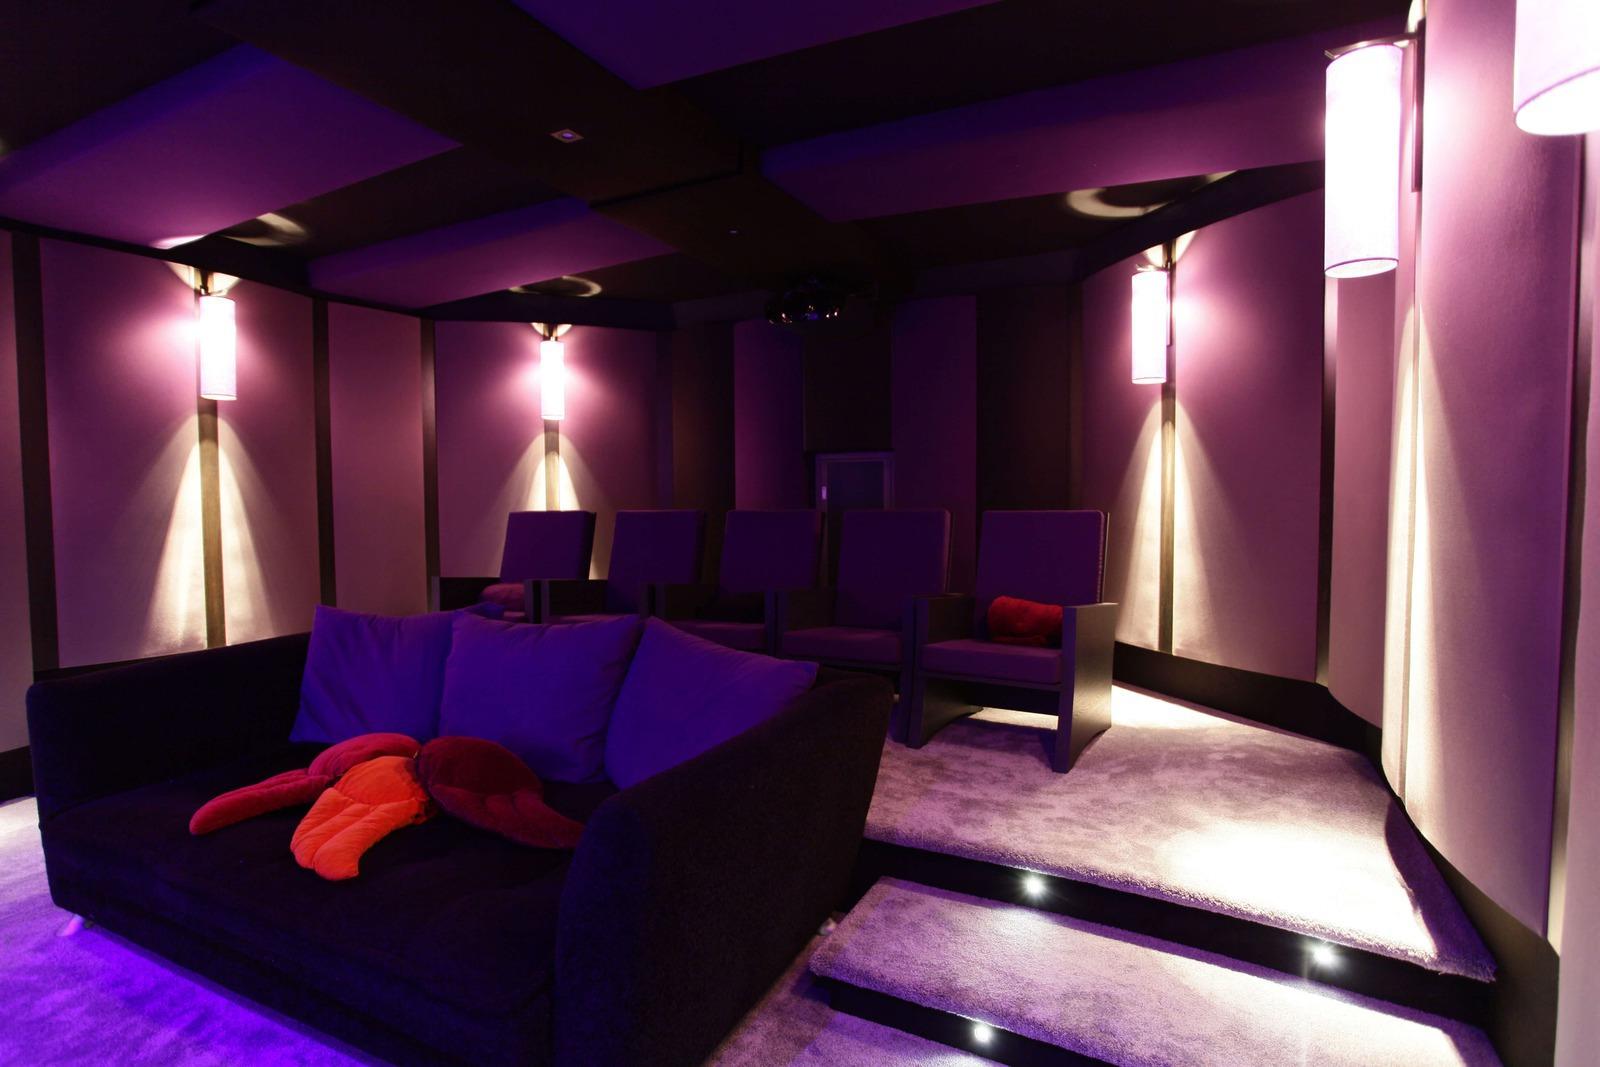 Cinema Prive Salle Dediee Ou Piece De Vie Home Cinema Tendances